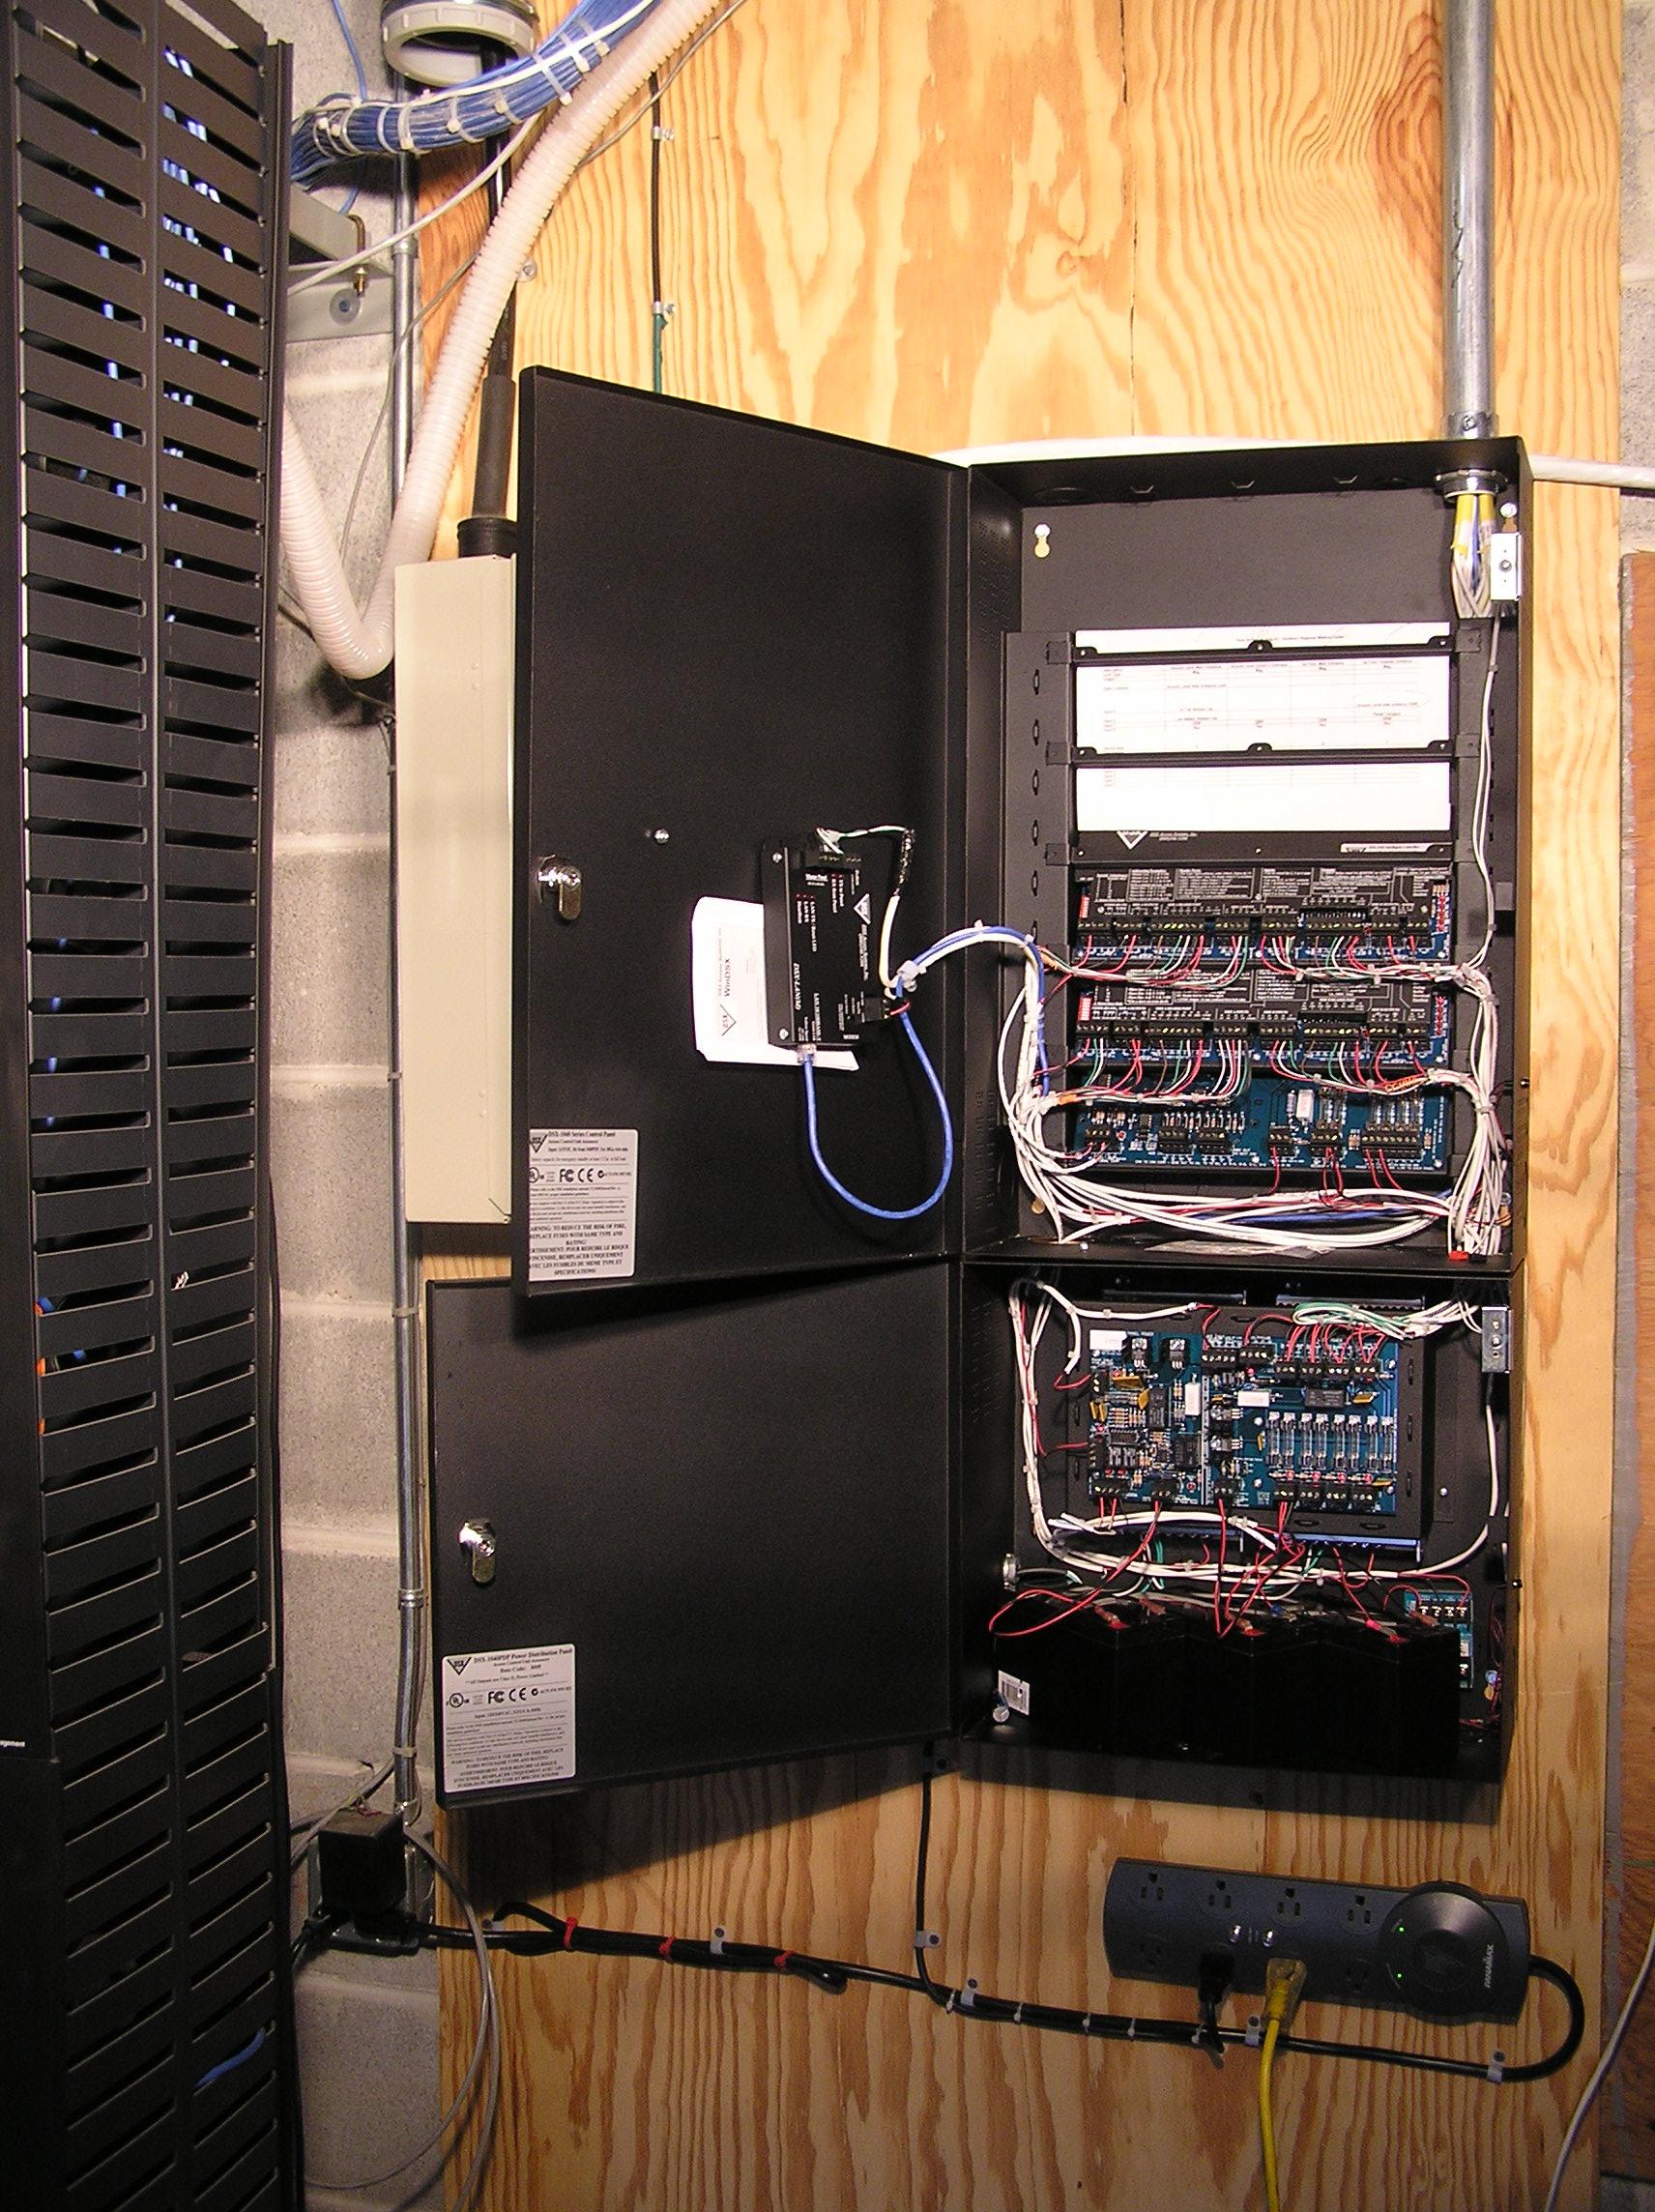 dsx wiring diagram schematic diagramsupplying 1040pdm dsx wiring diagram wiring diagram ethernet wiring diagram dsx panel wiring diagram wiring diagramsdsx